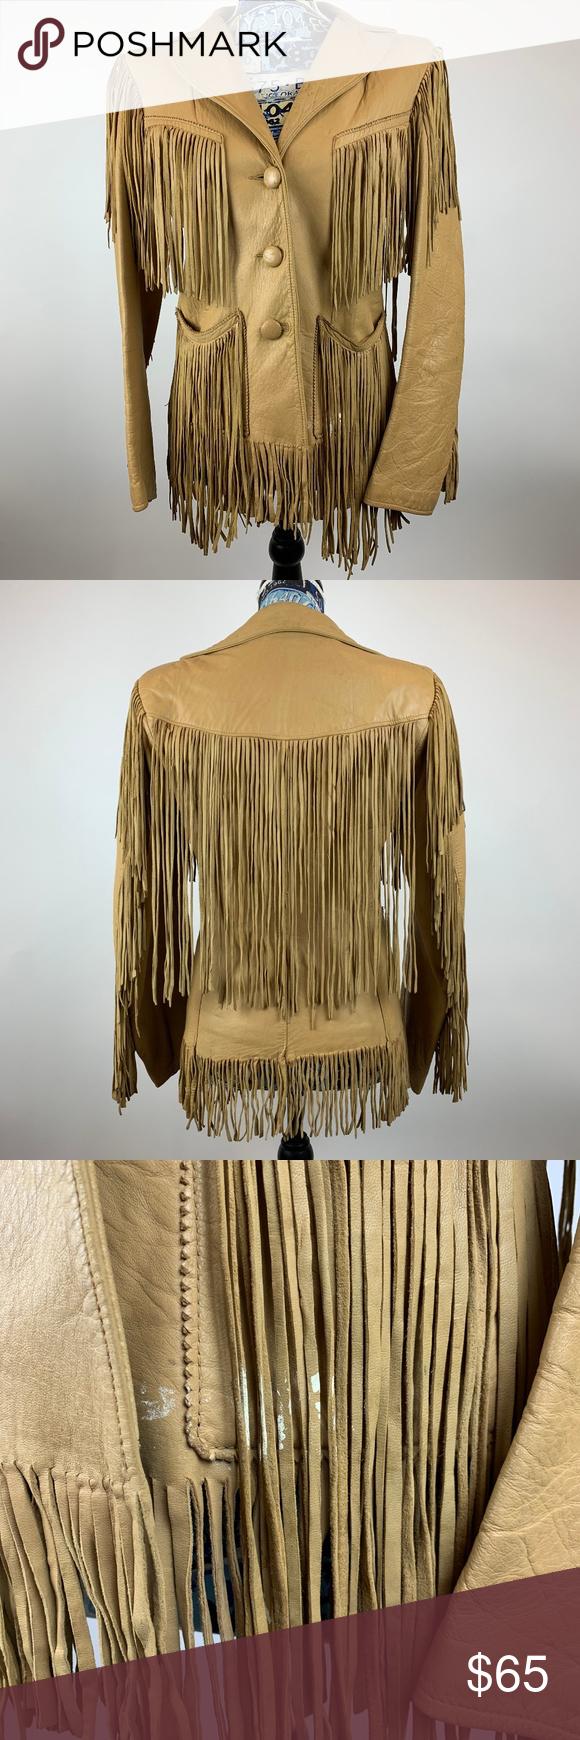 Vintage Western Fringe Womens Leather Jacket Very cool